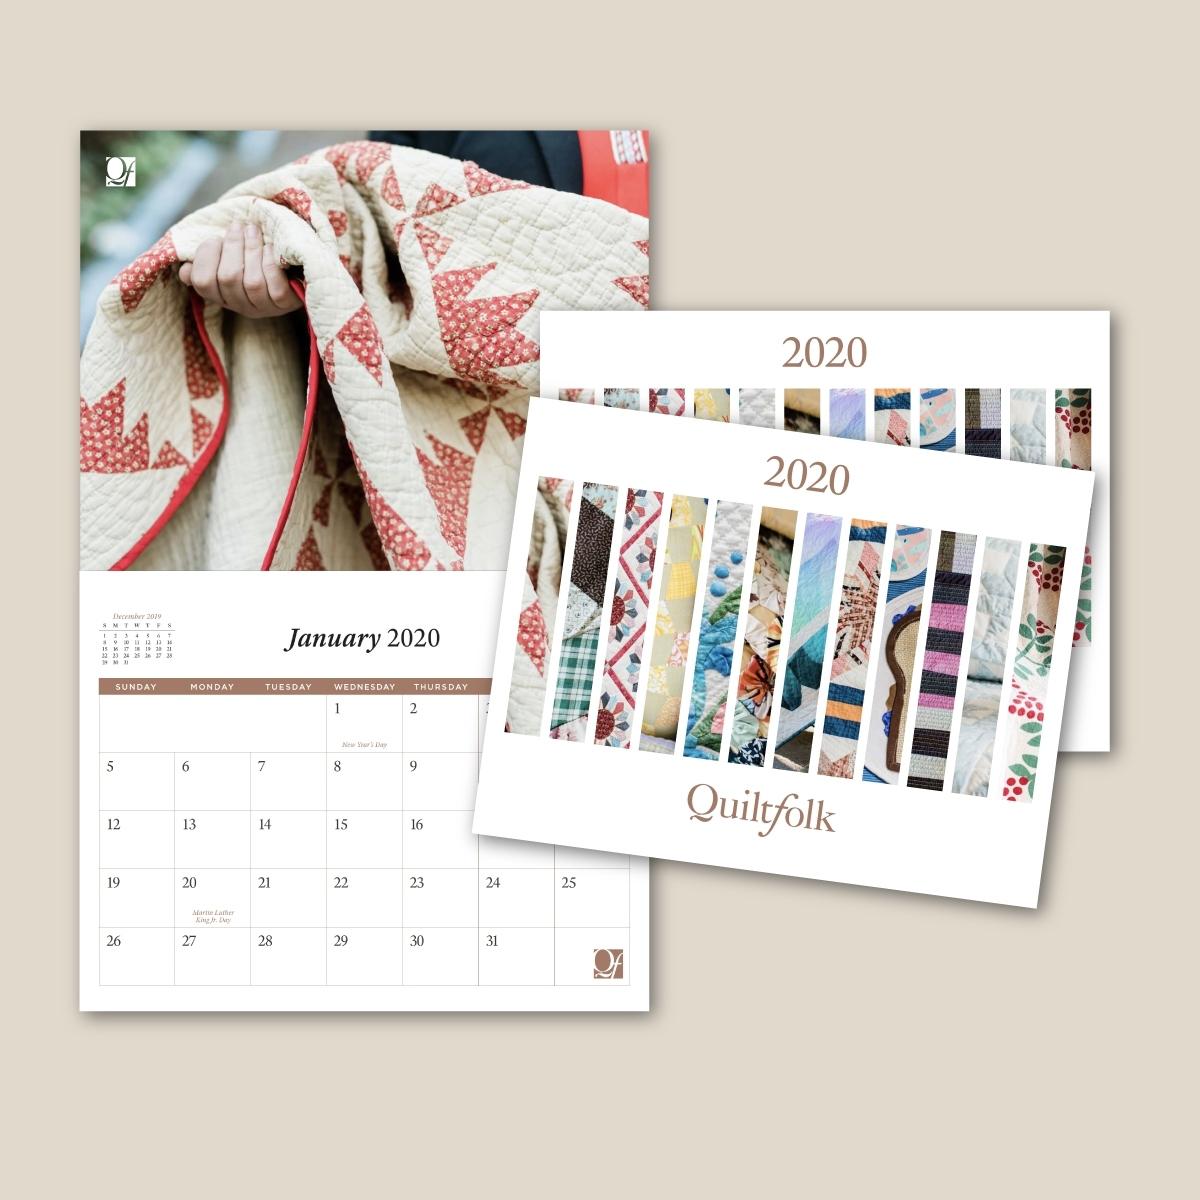 2020 Quiltfolk Calendar (Buy One, Get One Free) – Quiltfolk